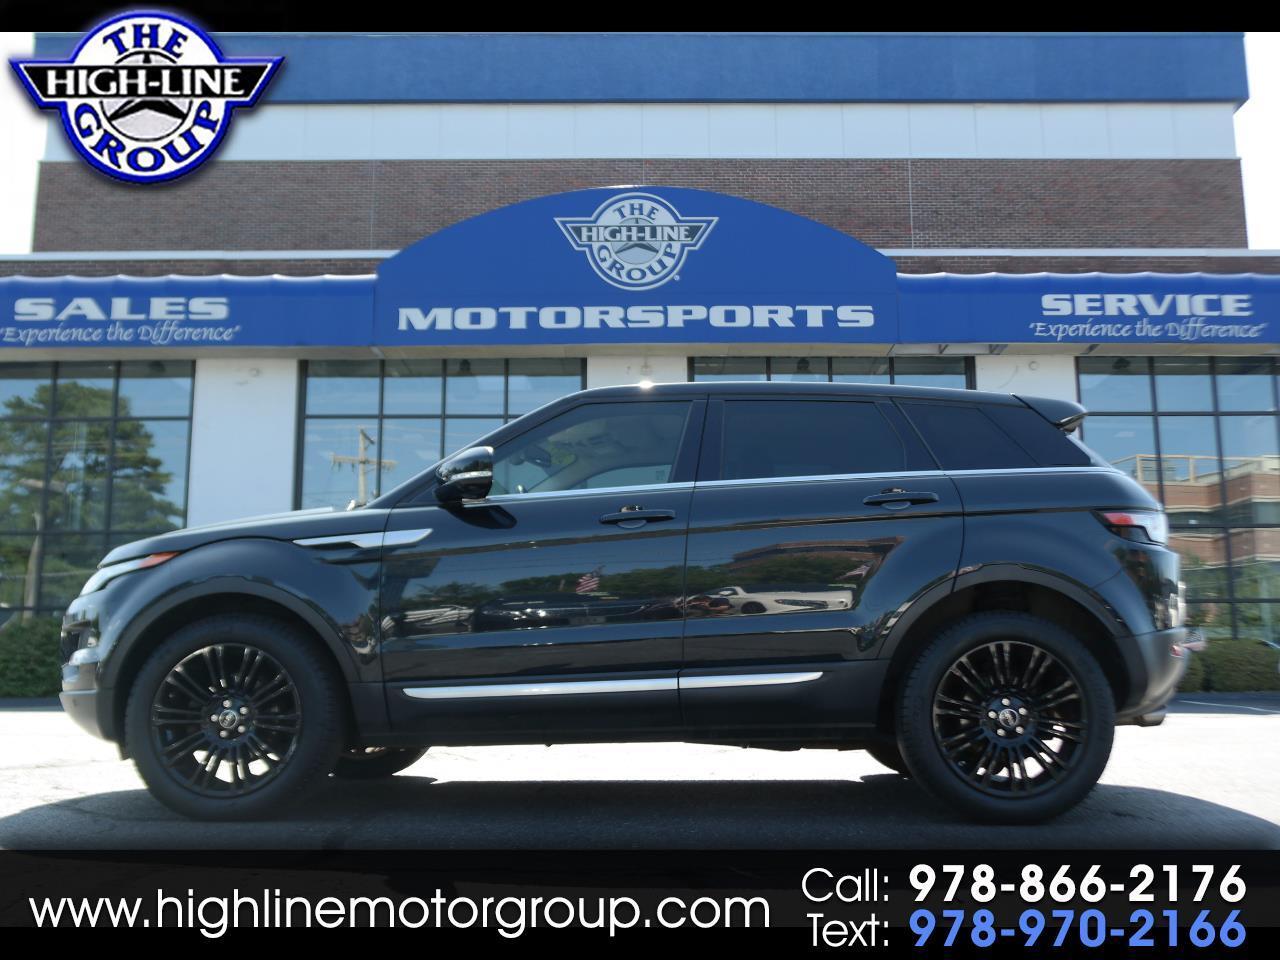 2012 Land Rover Range Rover Evoque 5dr HB Prestige Premium